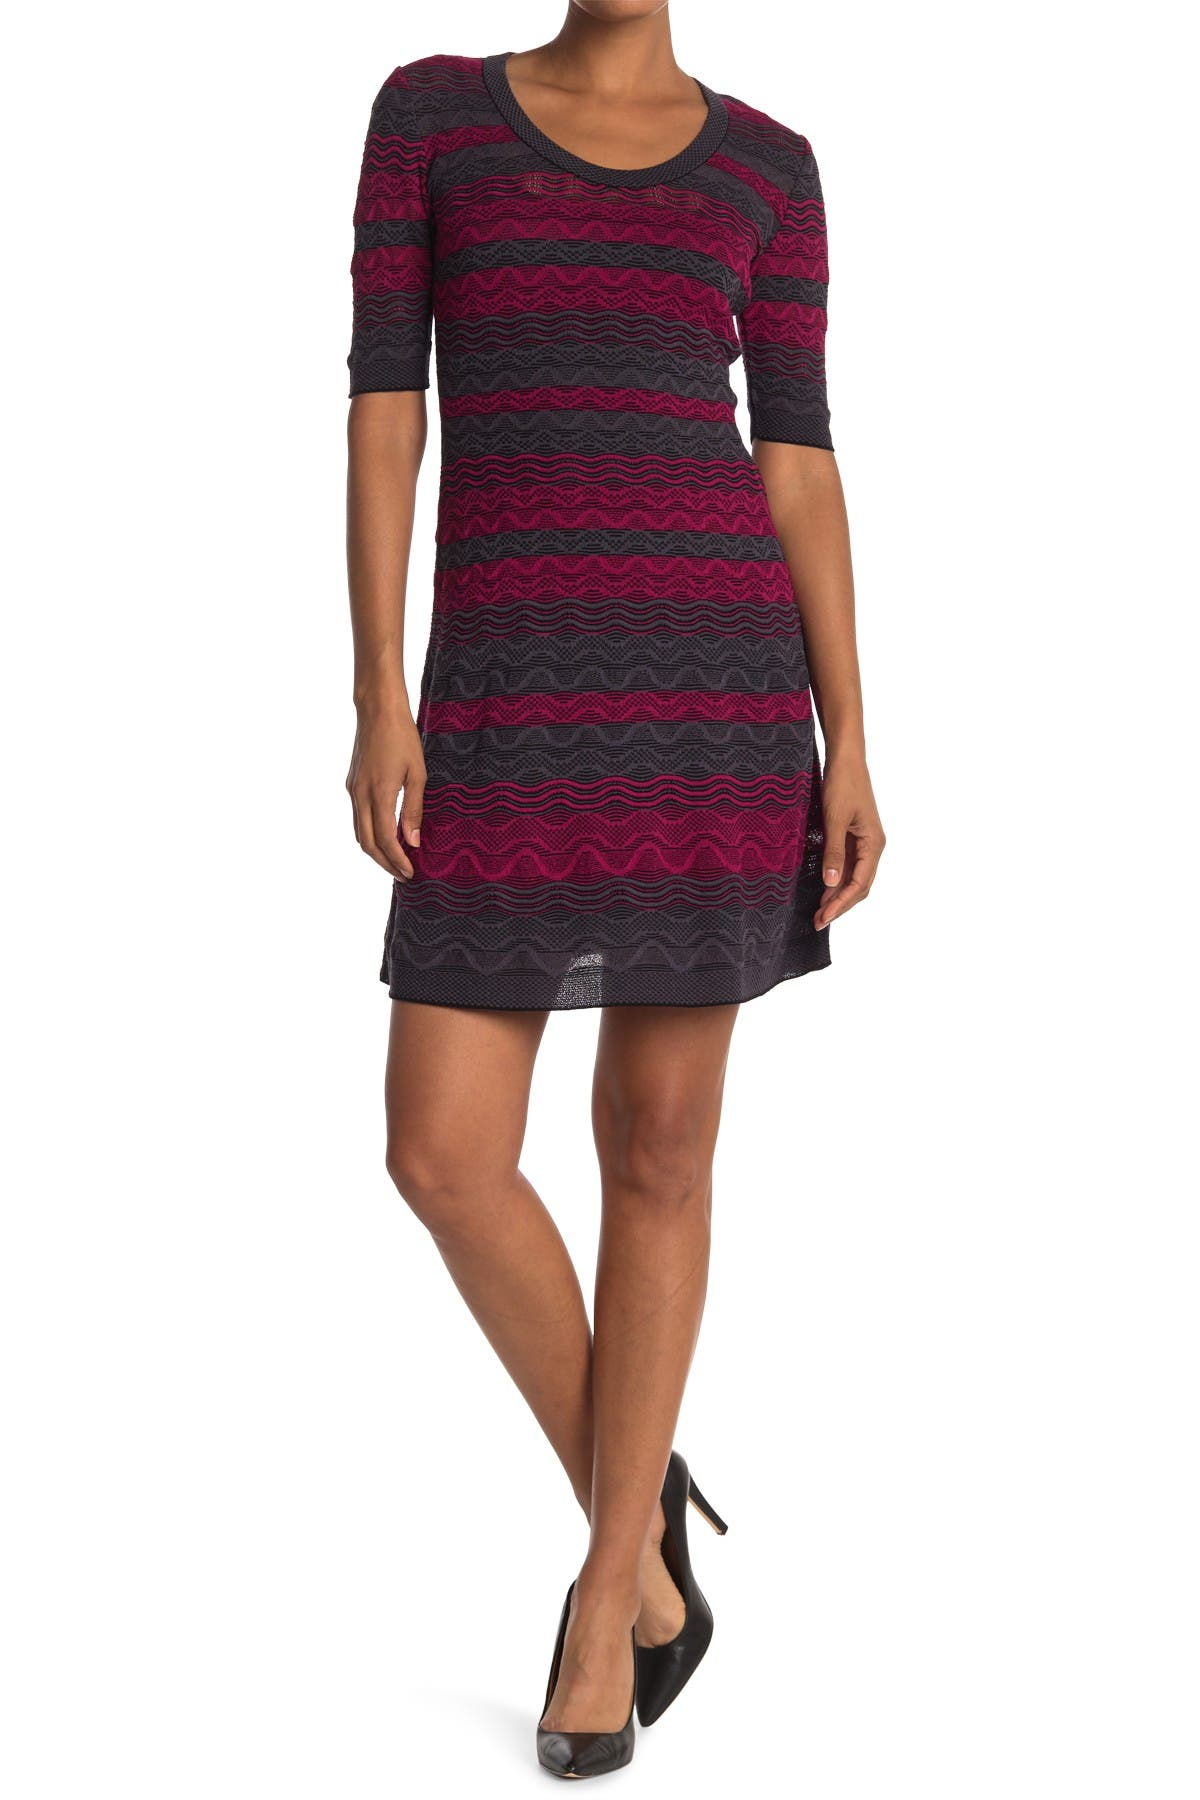 Image of M Missoni Patterned Elbow Sleeve Dress